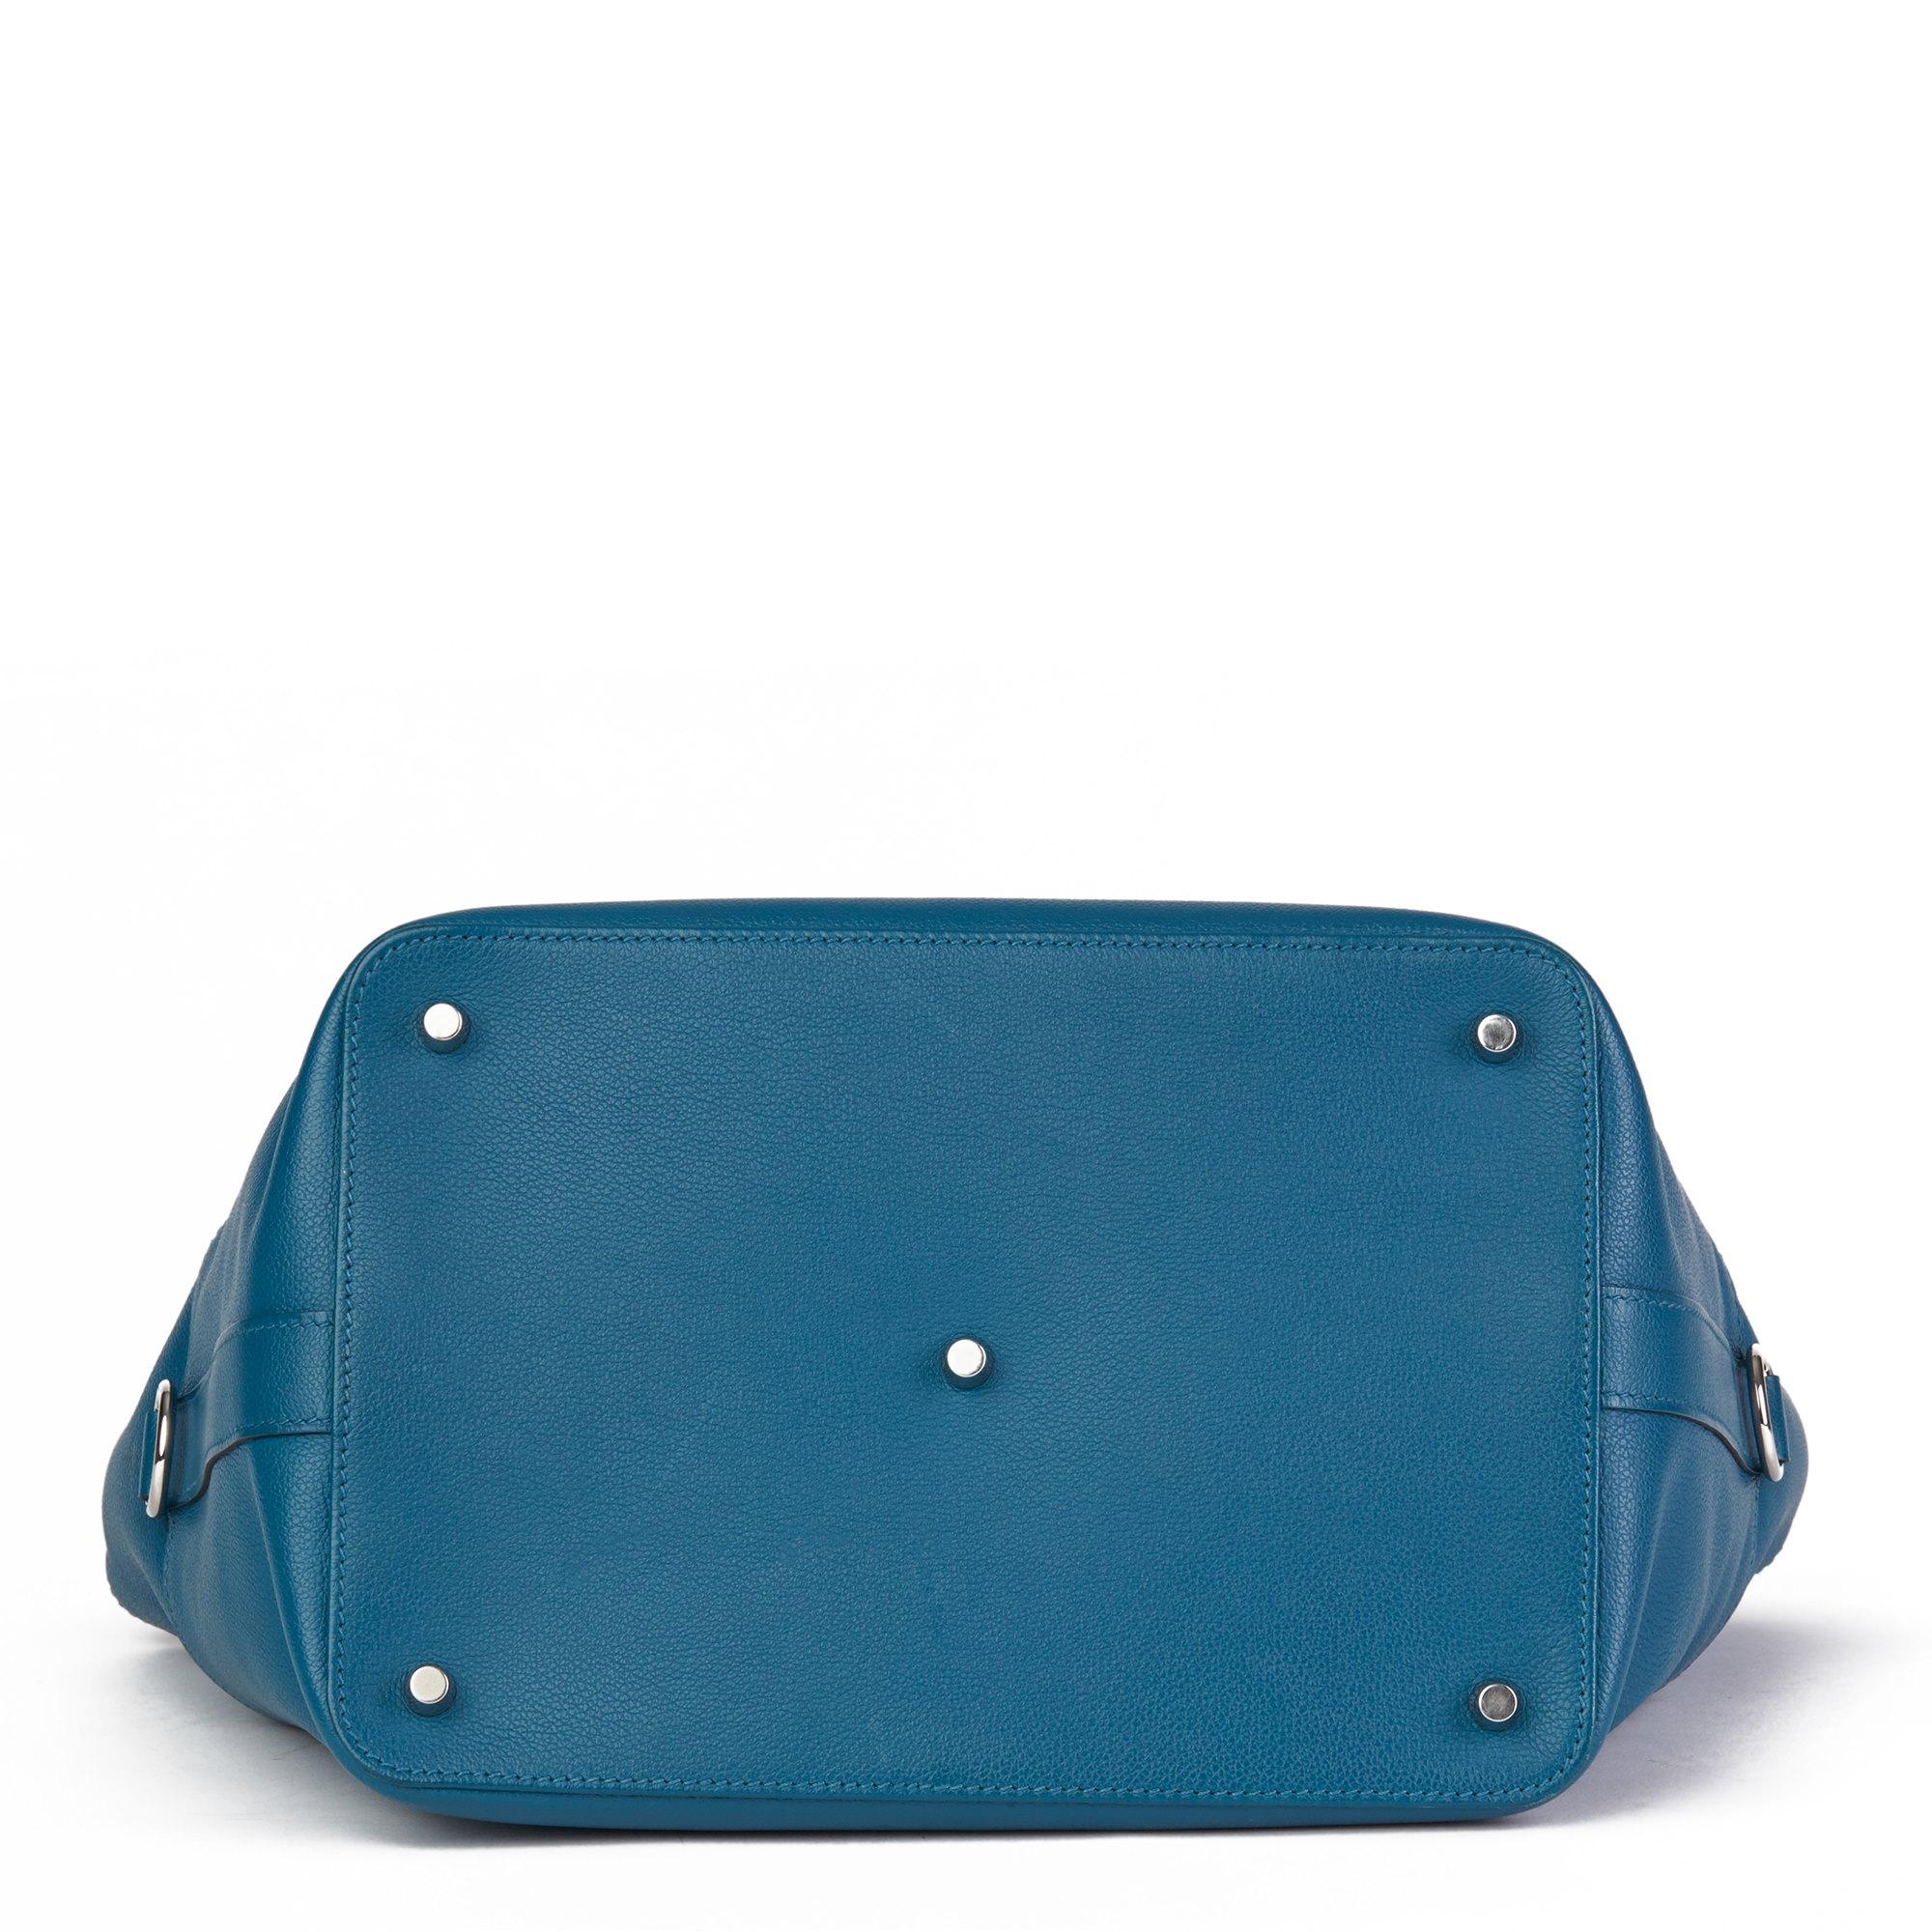 Hermès Blue Izmir Evercolour Leather Toolbox 26cm